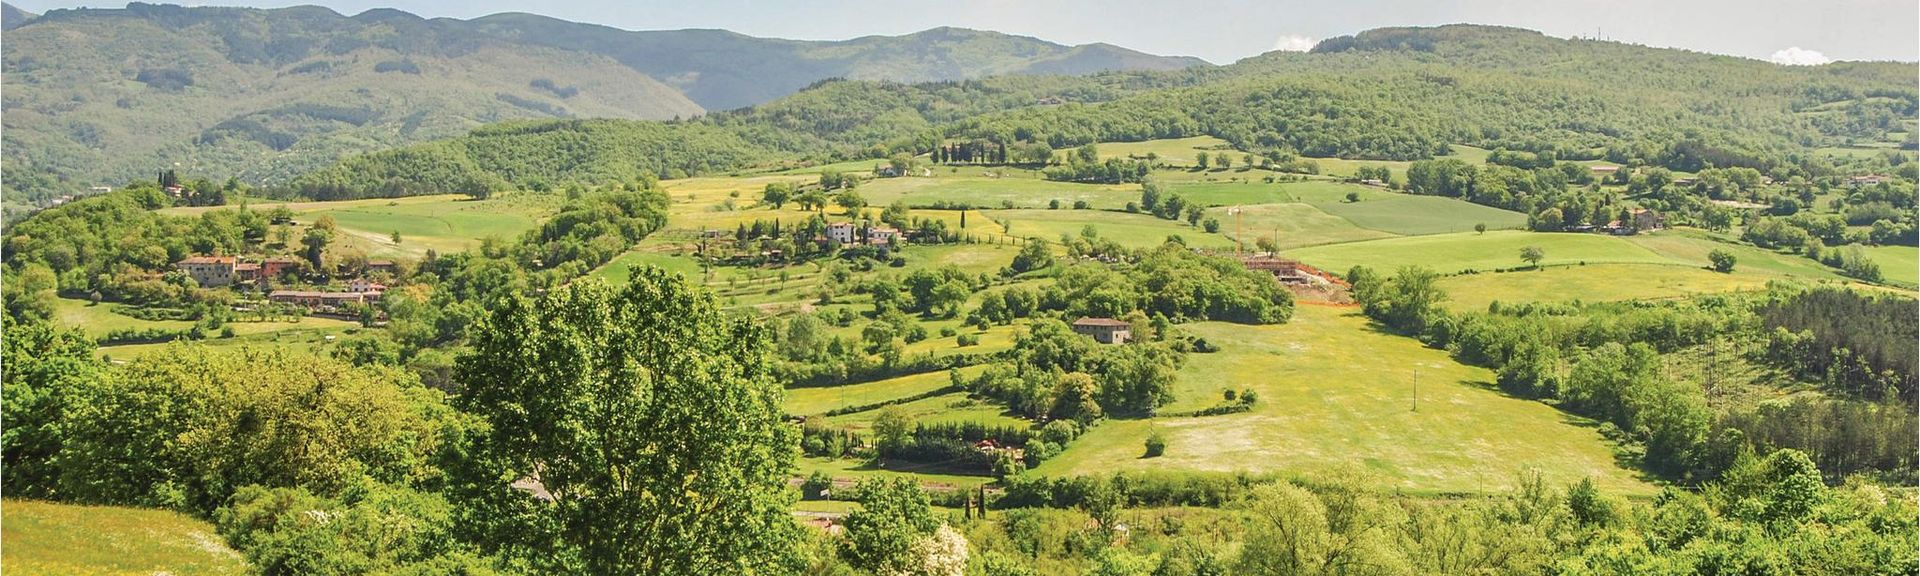 Laterina, Pergine Valdarno, Toscana, Italia